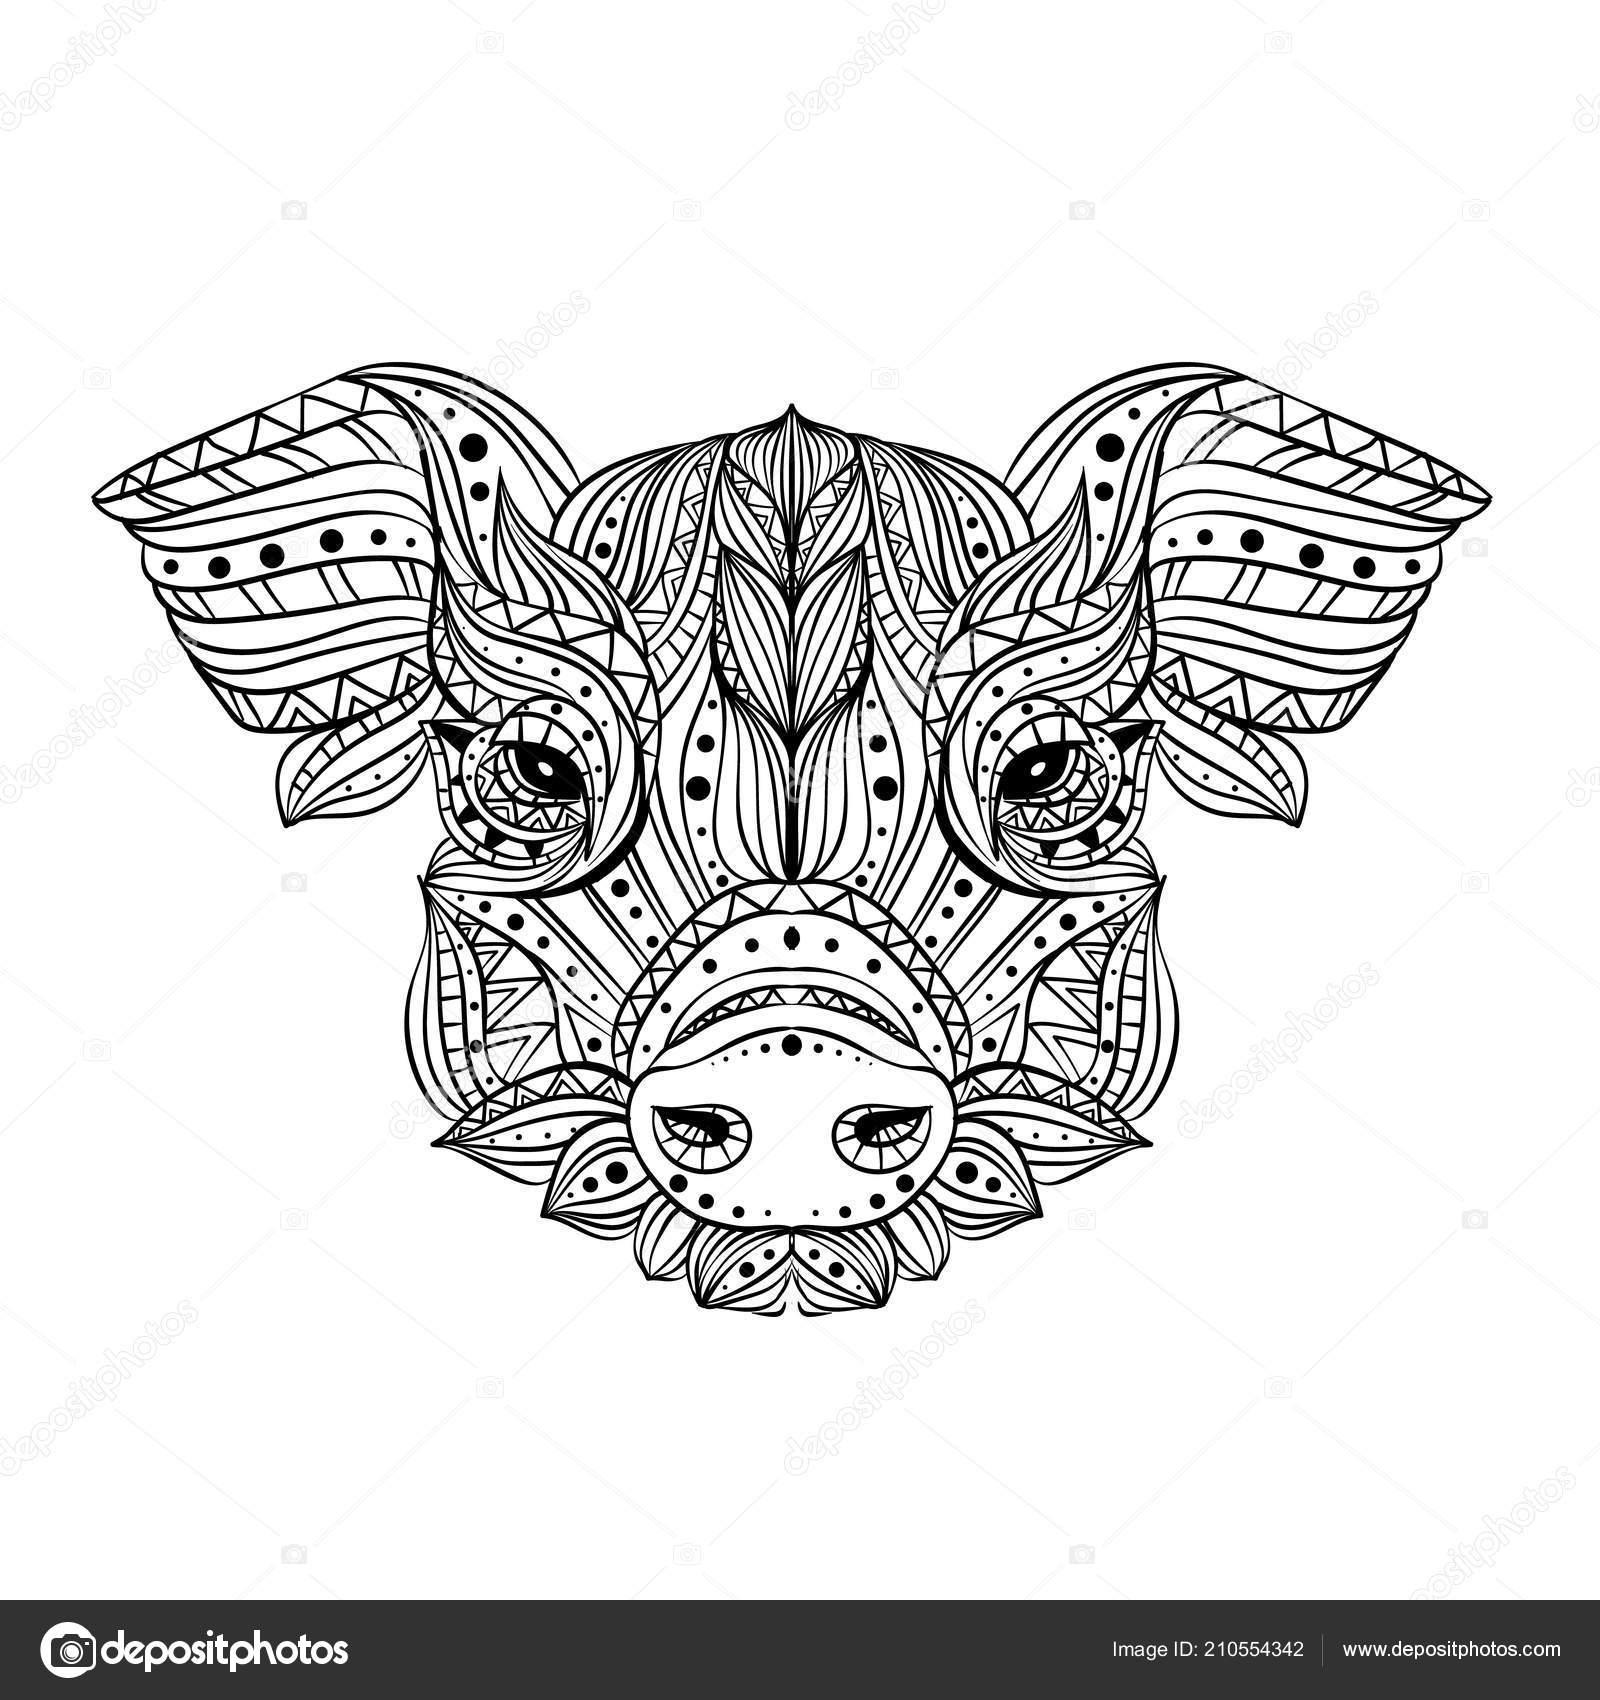 Cabeza Jabali Meditacion Colorante Mandala Cabeza Chancho Con Pelo